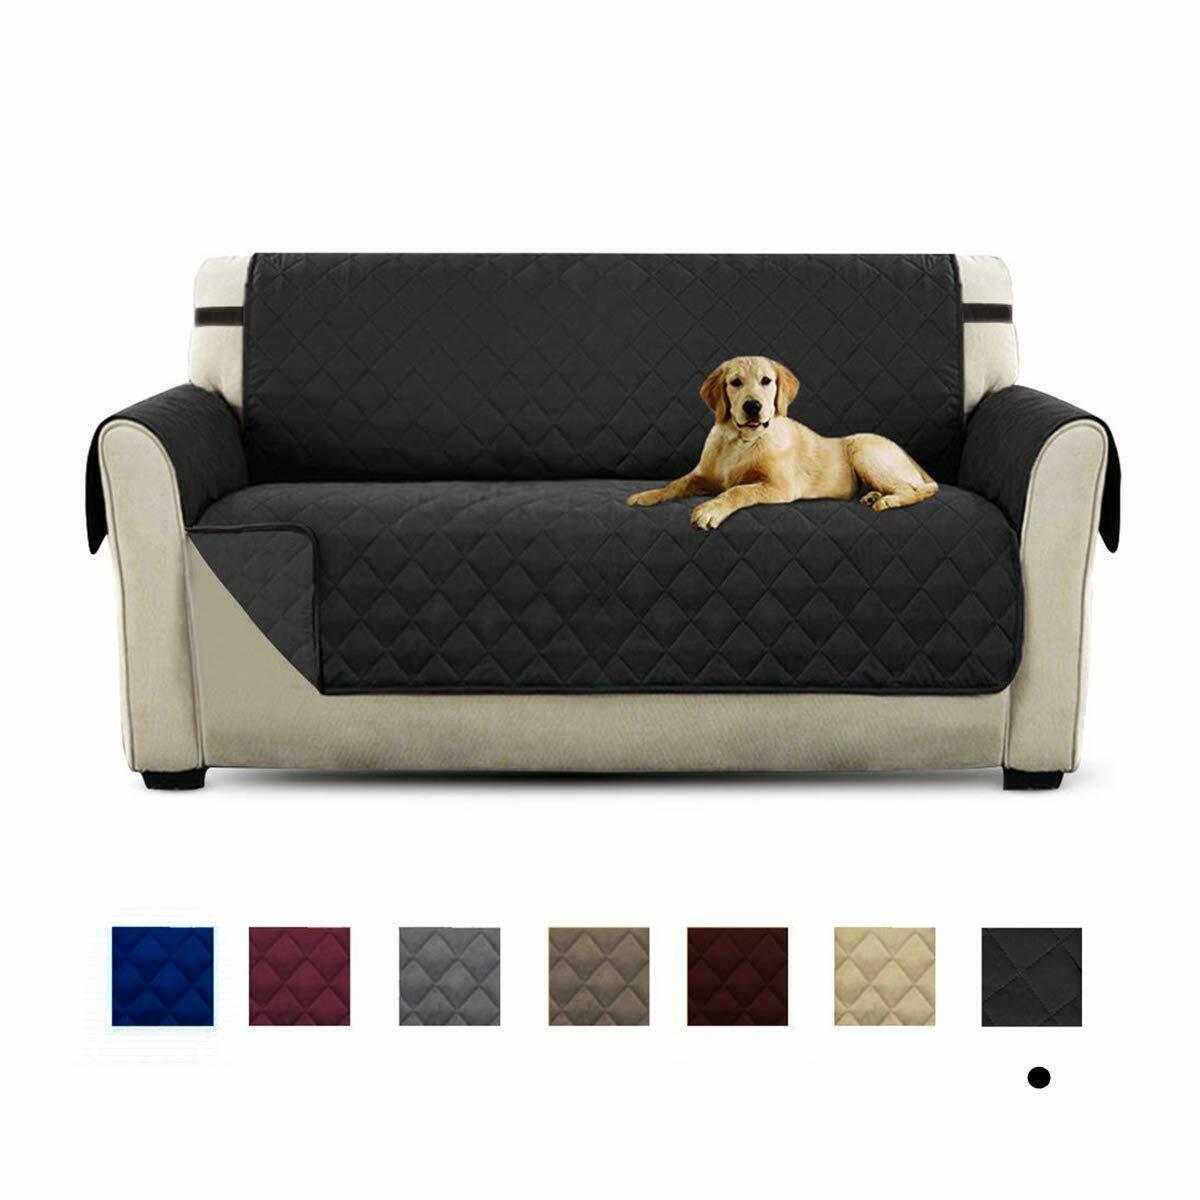 Waterproof Pet Kids Mat Furniture Protector Sofa Cover Slipcover Fit Home Decor